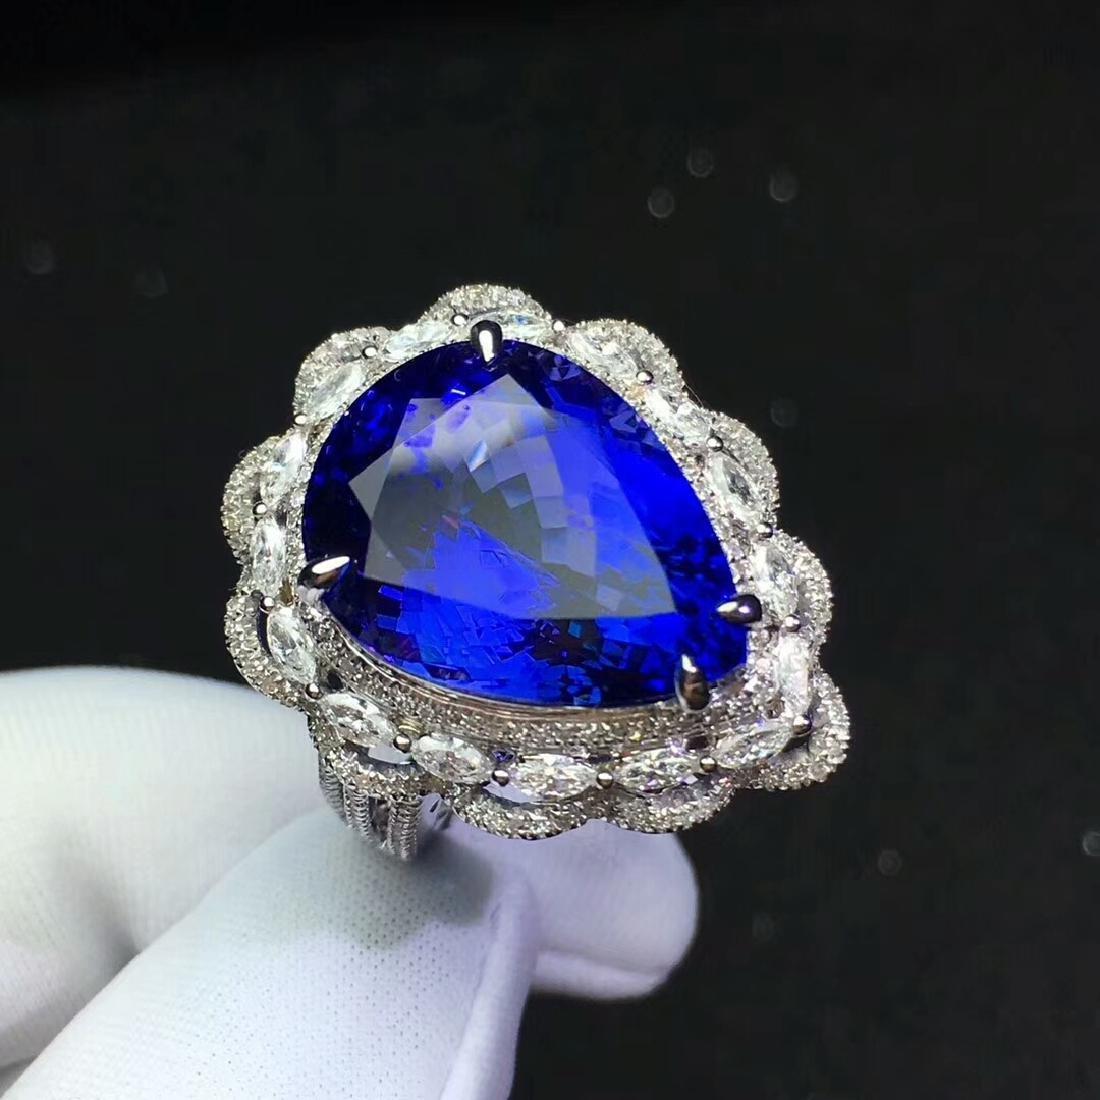 13.6ct Tanzanite Ring in 18kt White Gold - 2